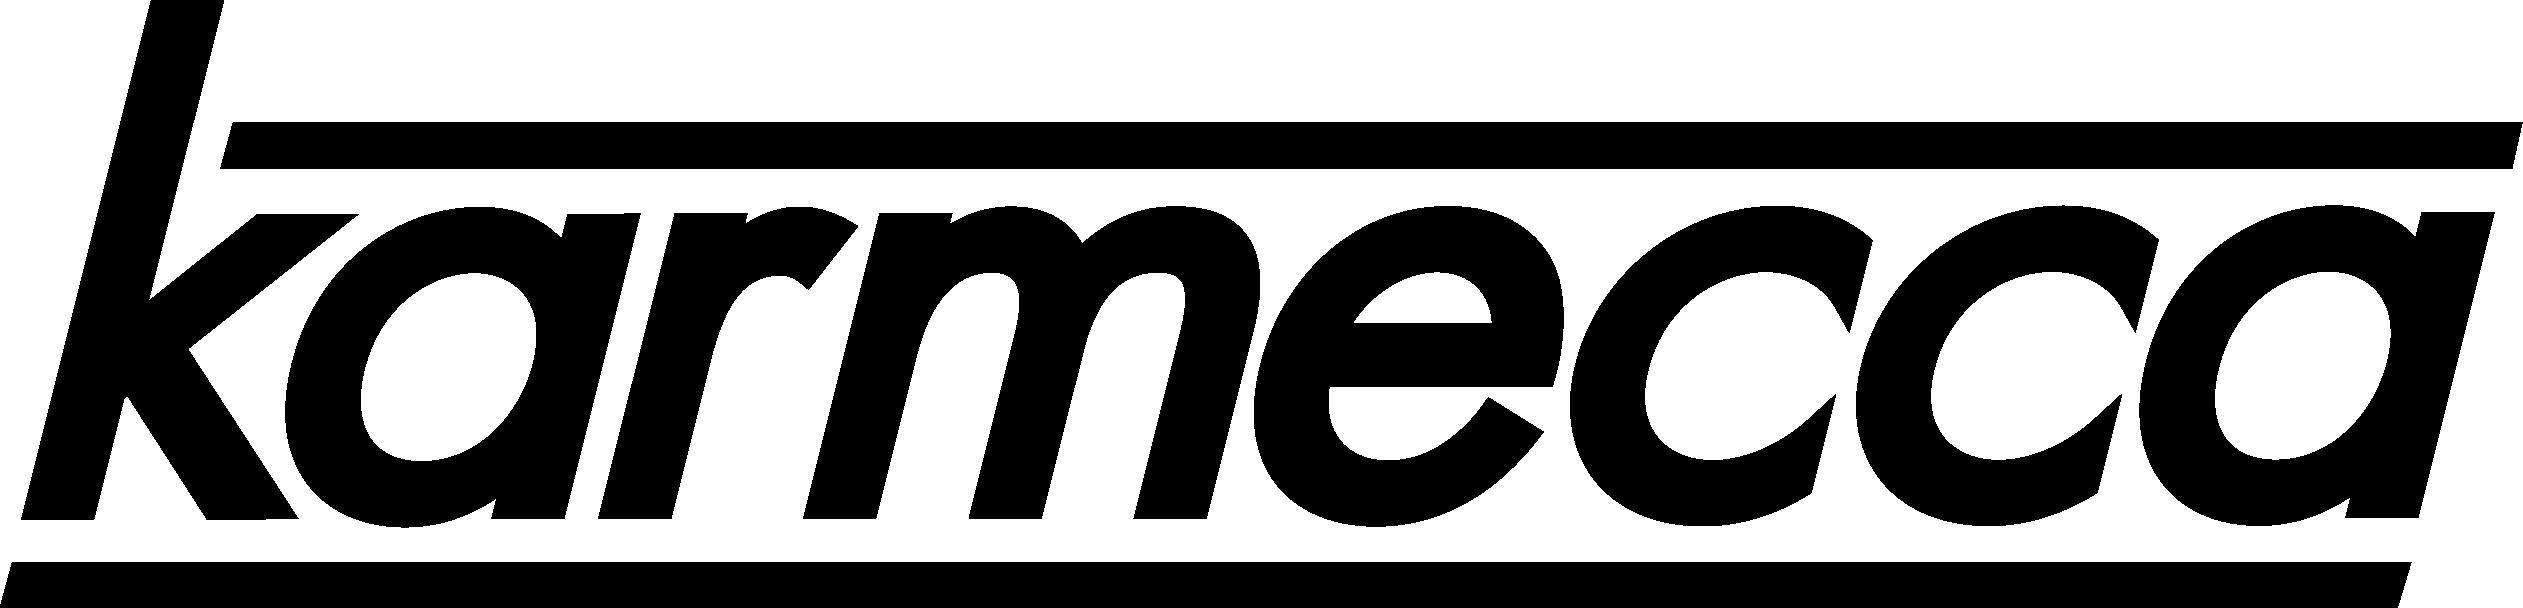 KARMECCA